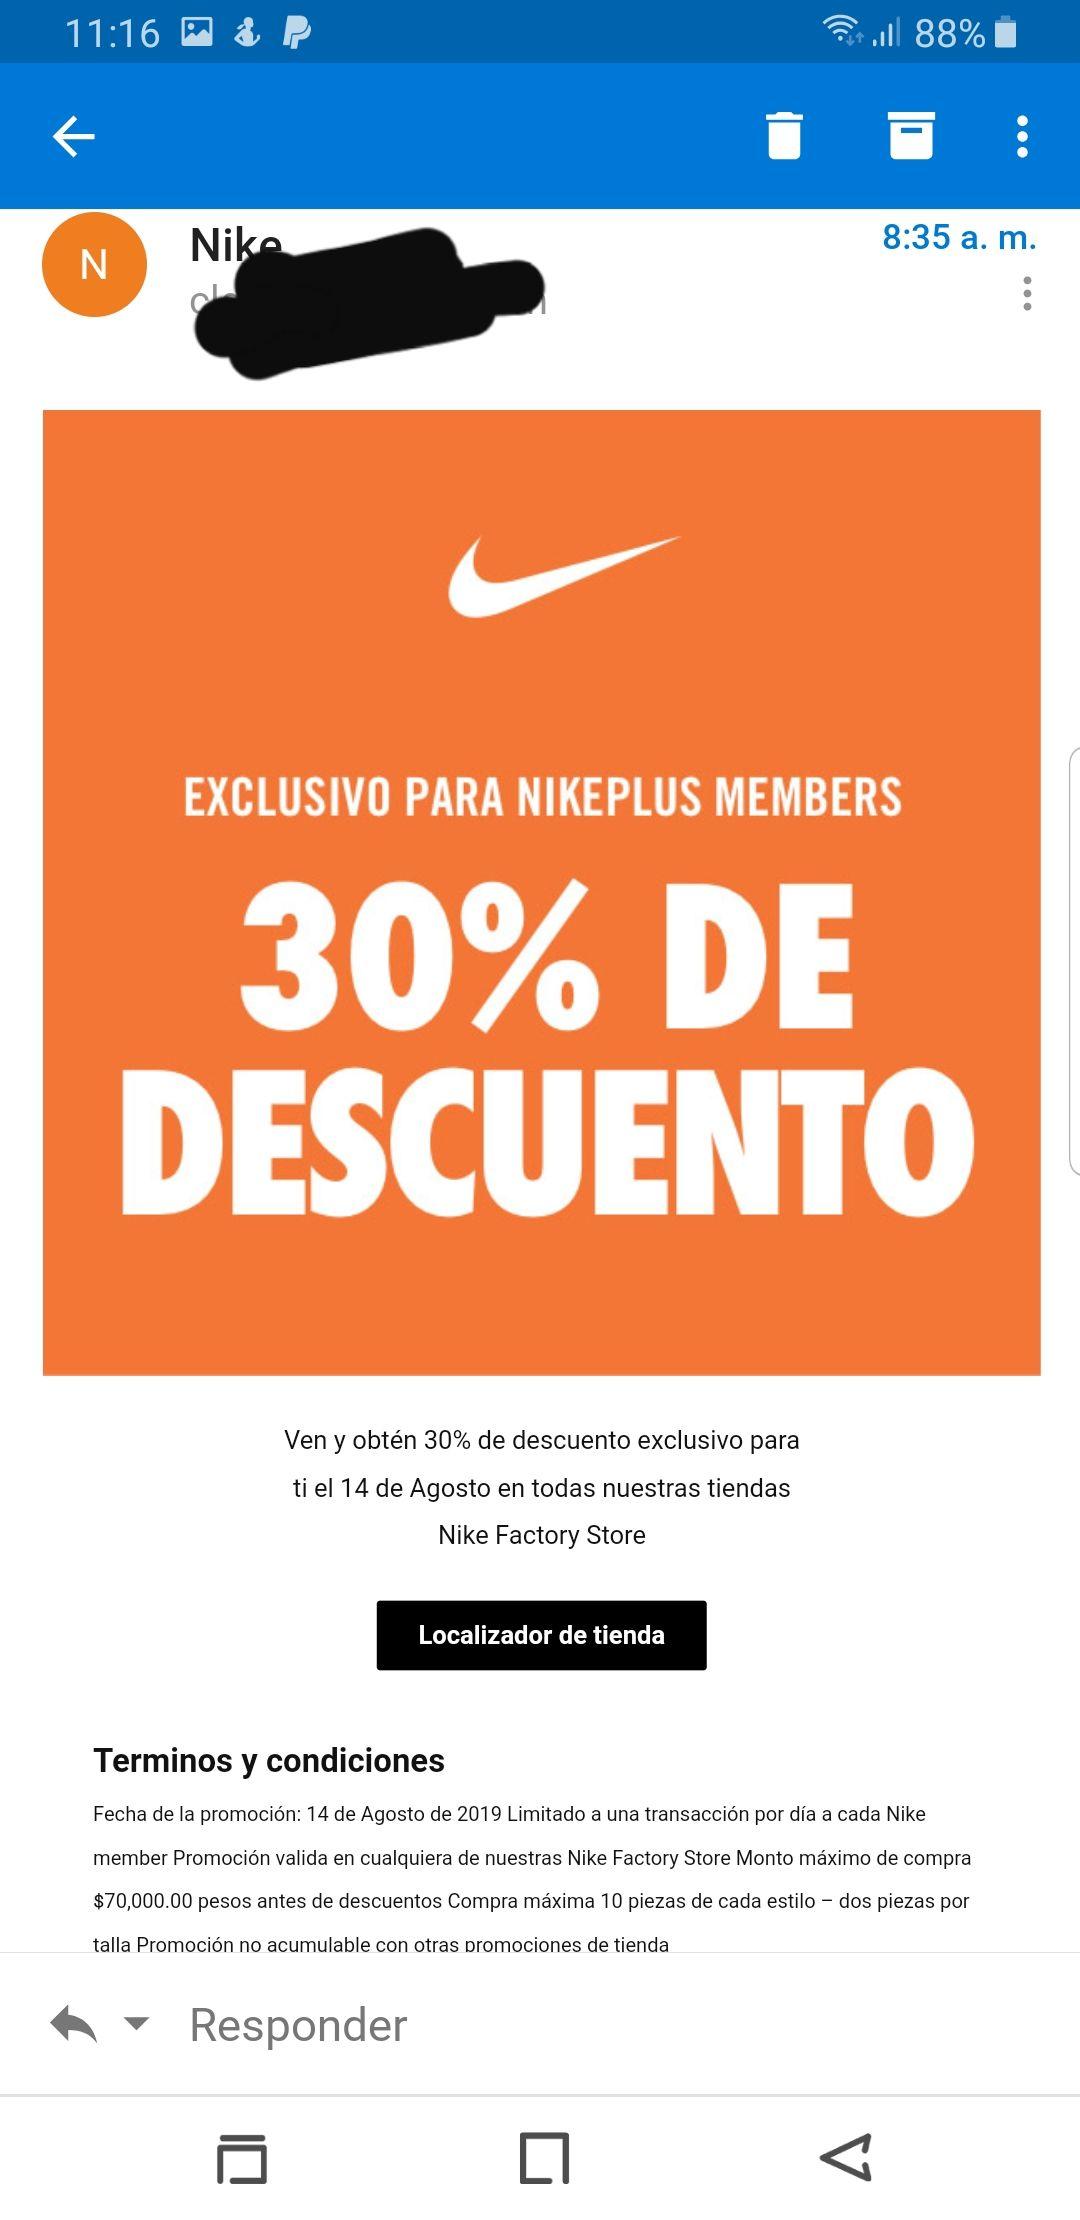 Nike factory store: 30% de descuento por ser nike member